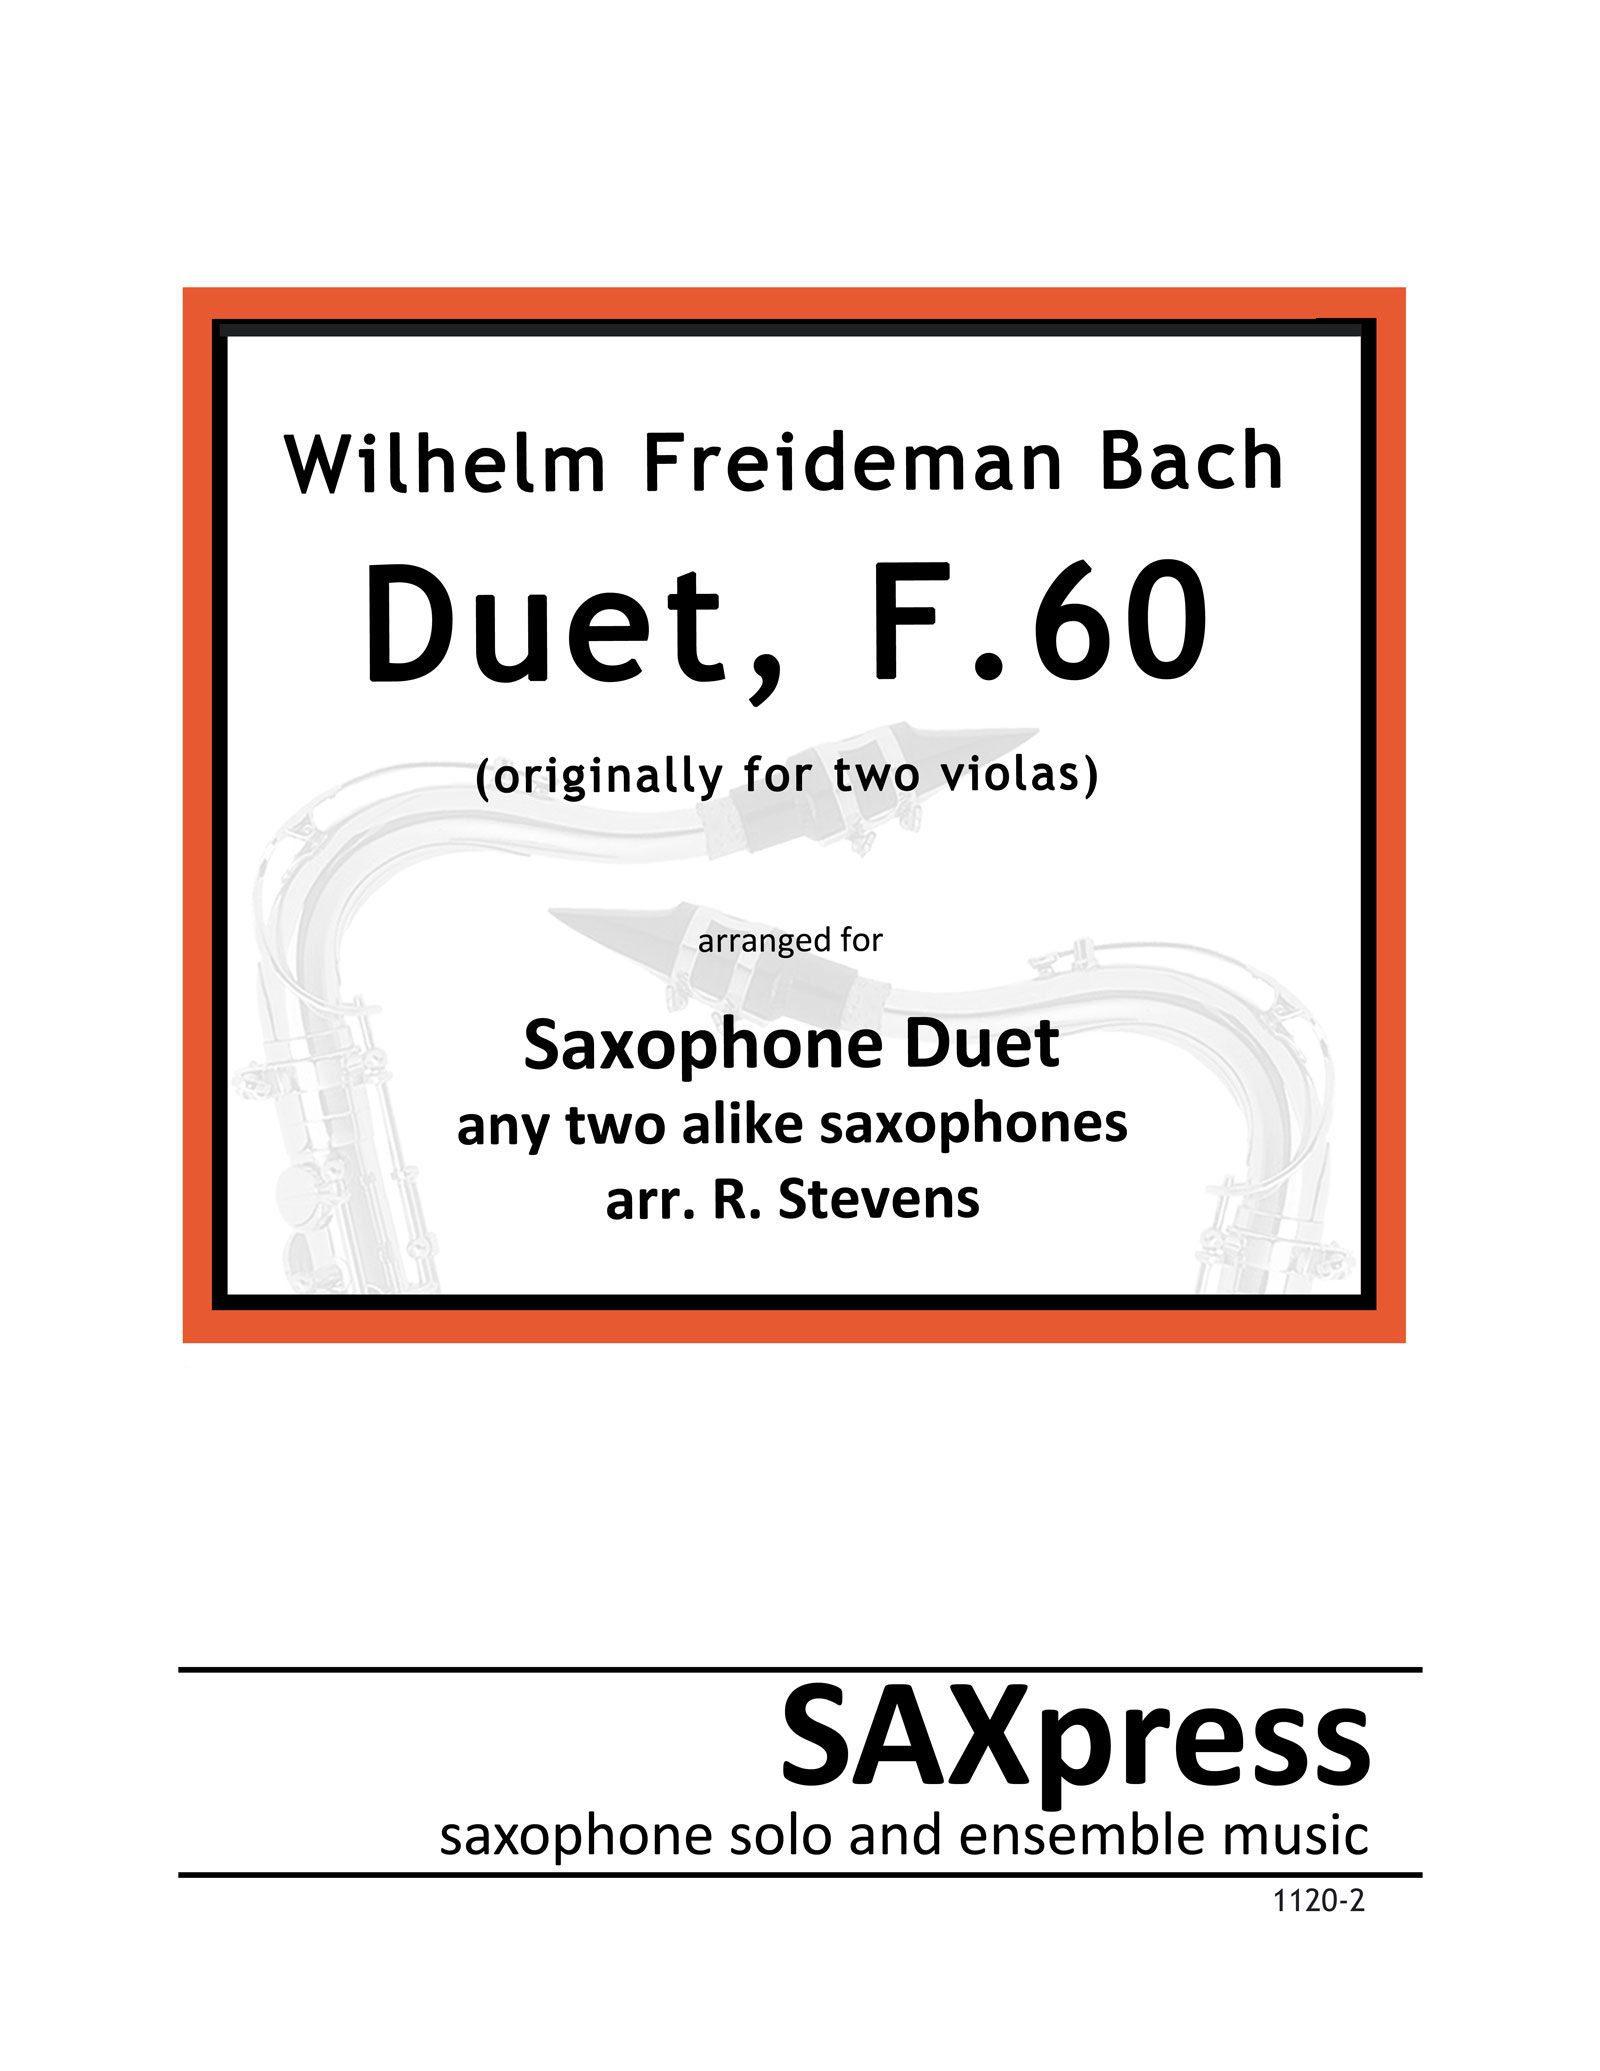 WF Bach Duet, F60 for 2 saxophones